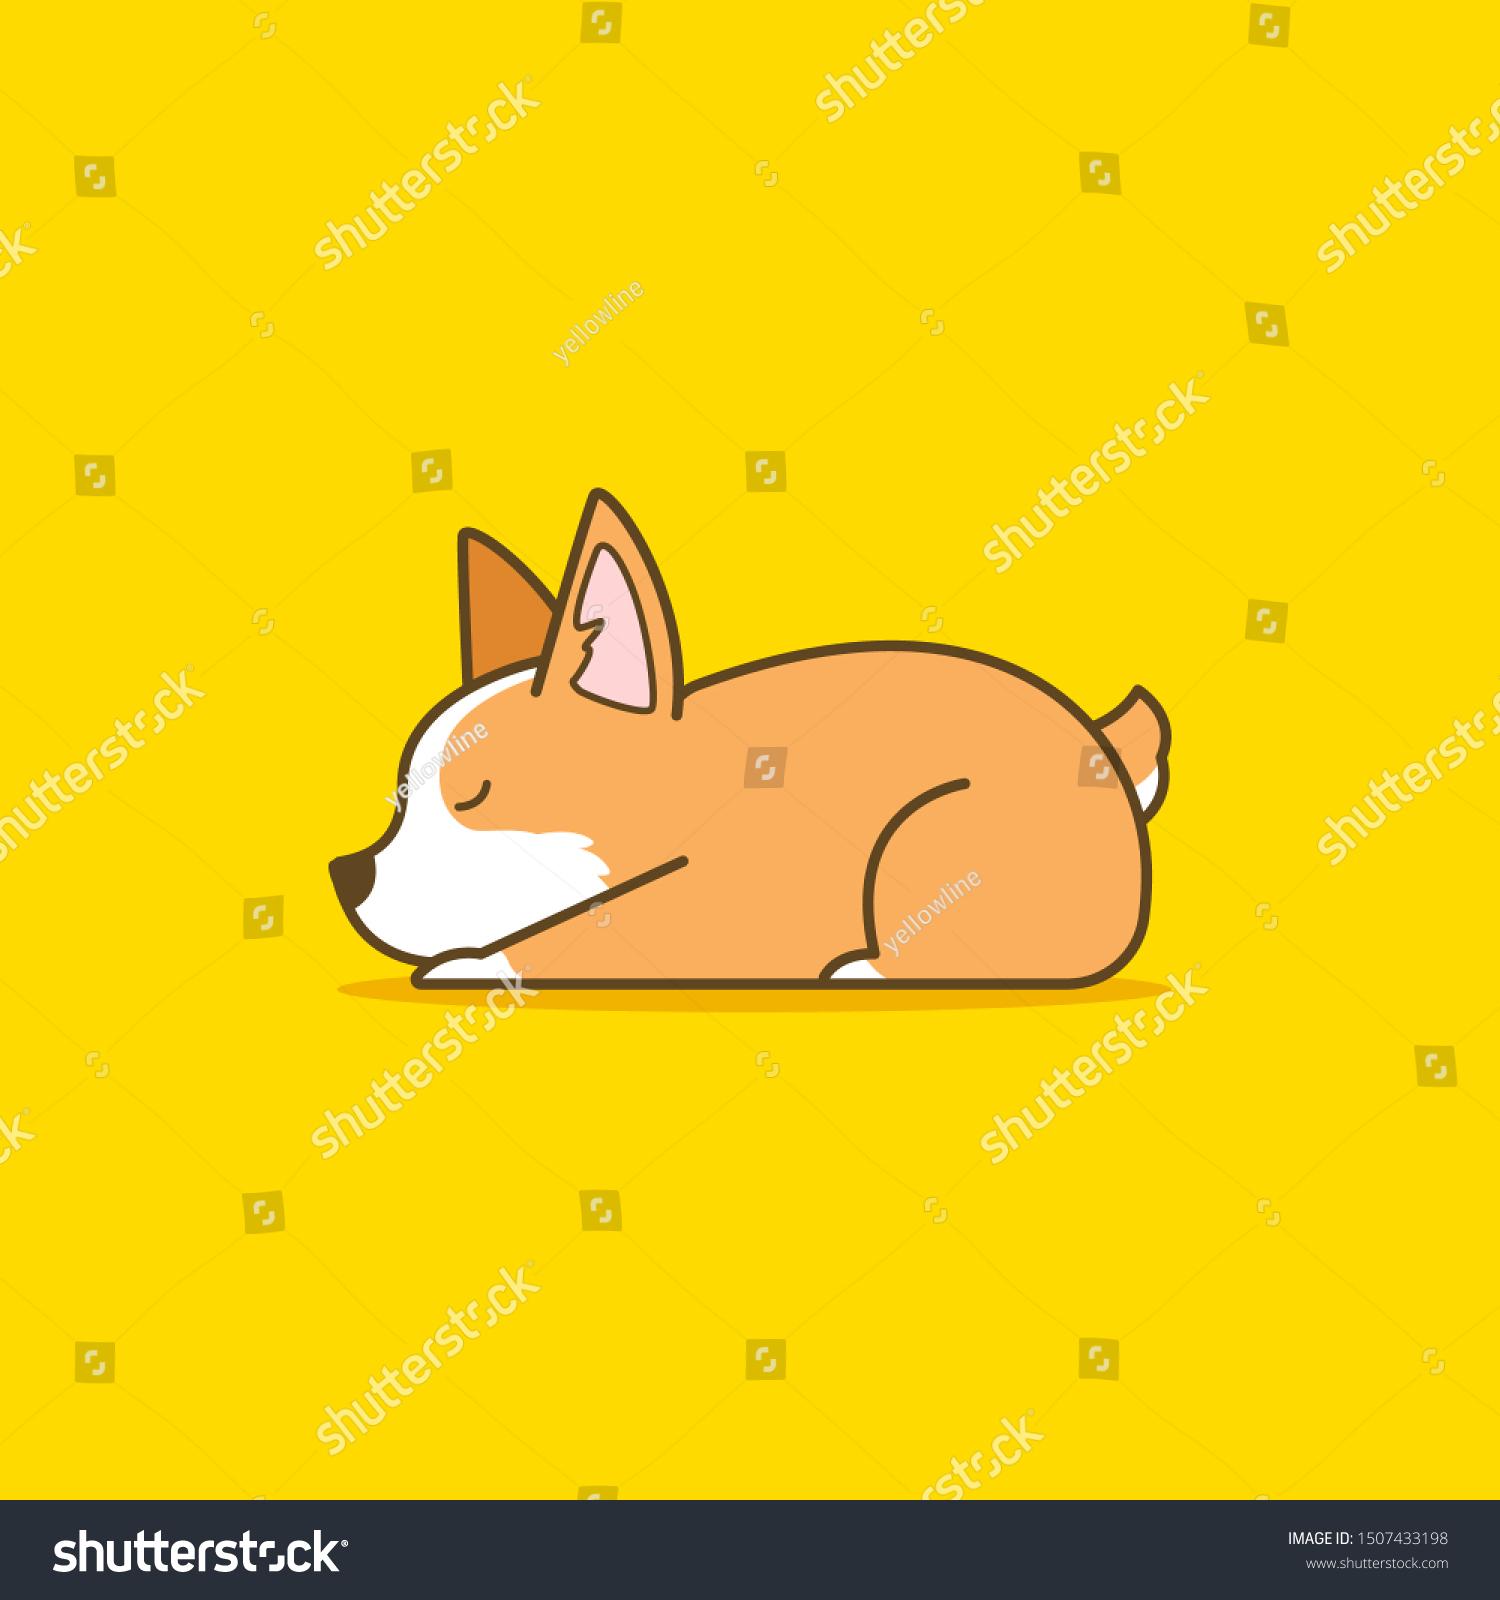 Sleeping Dog Illustration Sleeping Corgi Print Illustration Art Print Corgi Dog Illustration